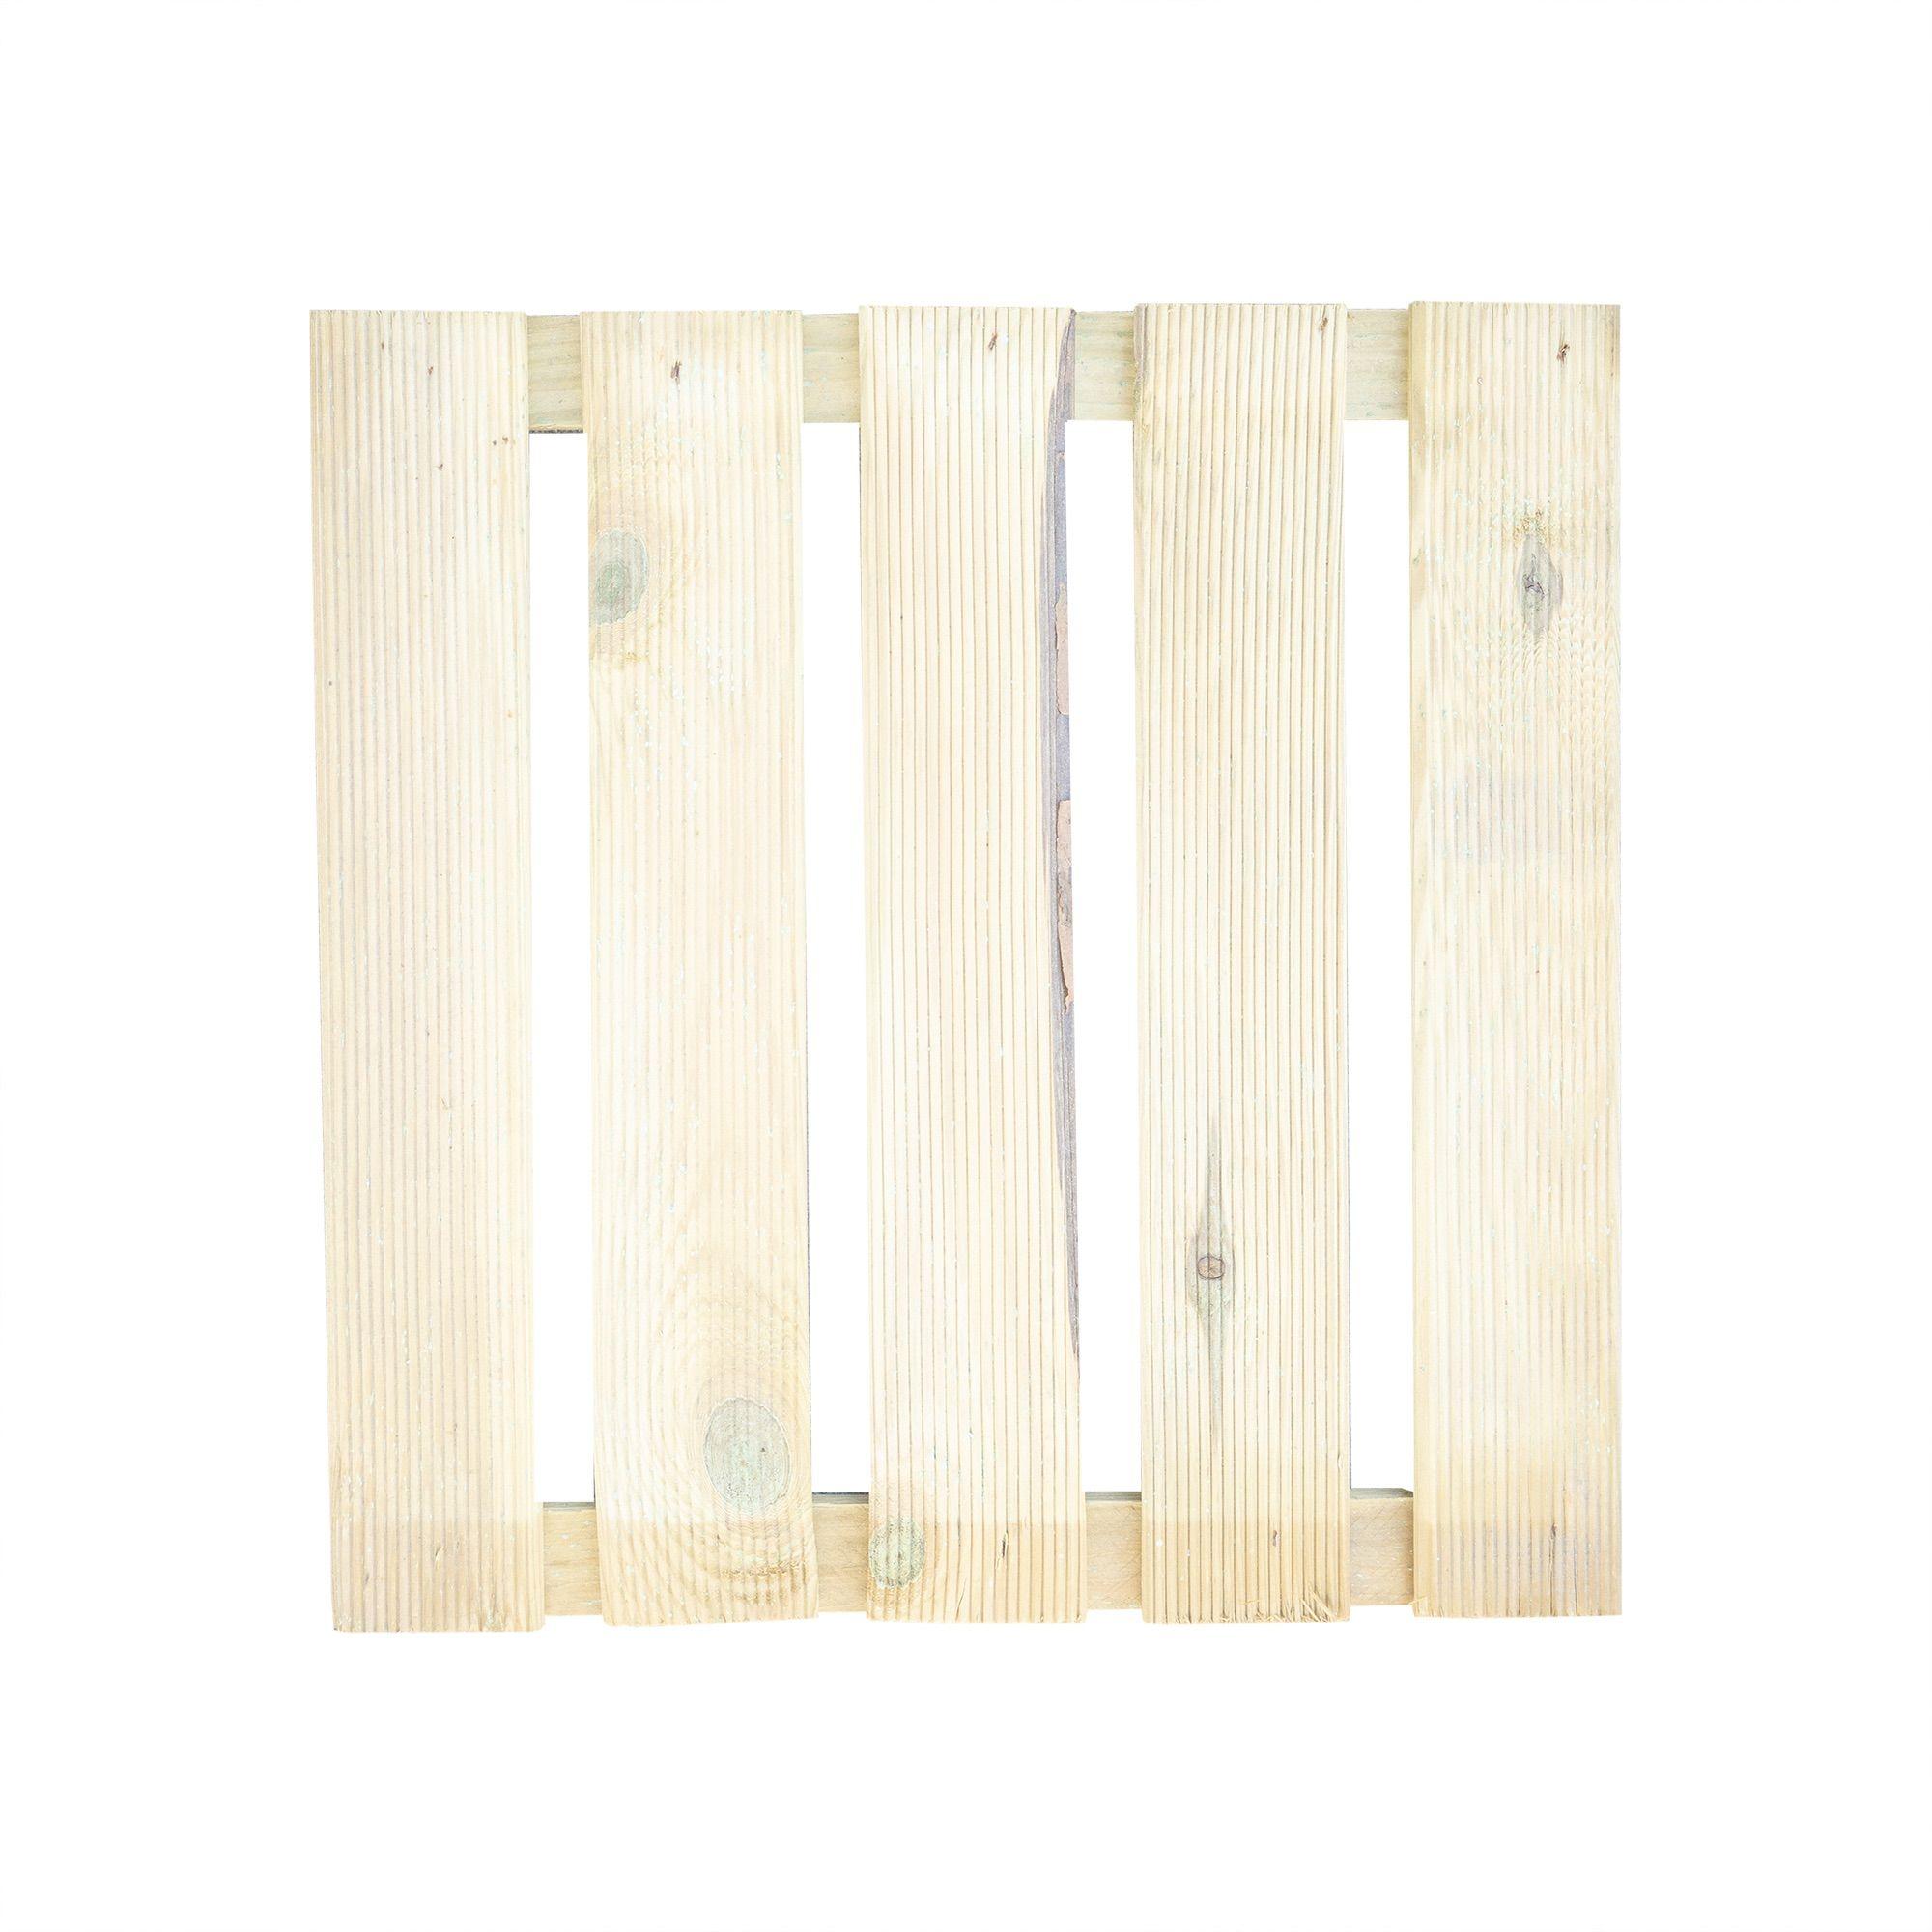 Dala pin Sara 40 x 40 x 2.4 cm